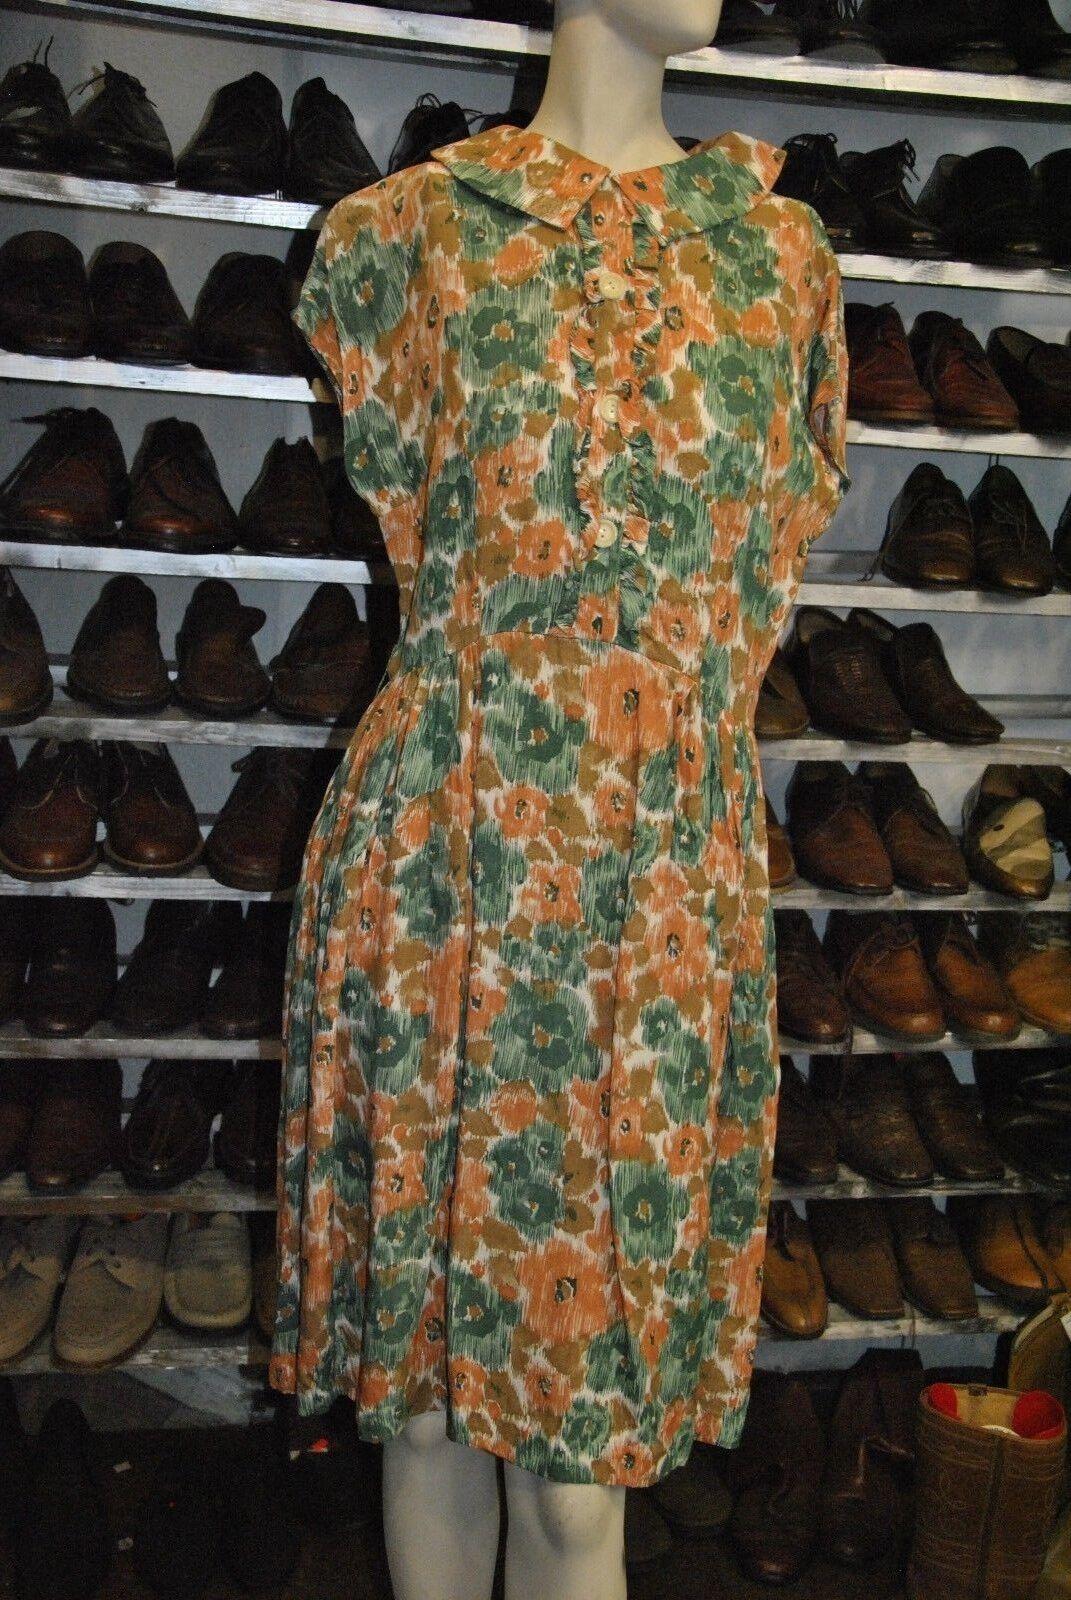 Antik 30er Blümchenkleid Kleid TRUE VINTAGE Damenkleid 30s dress flower antique